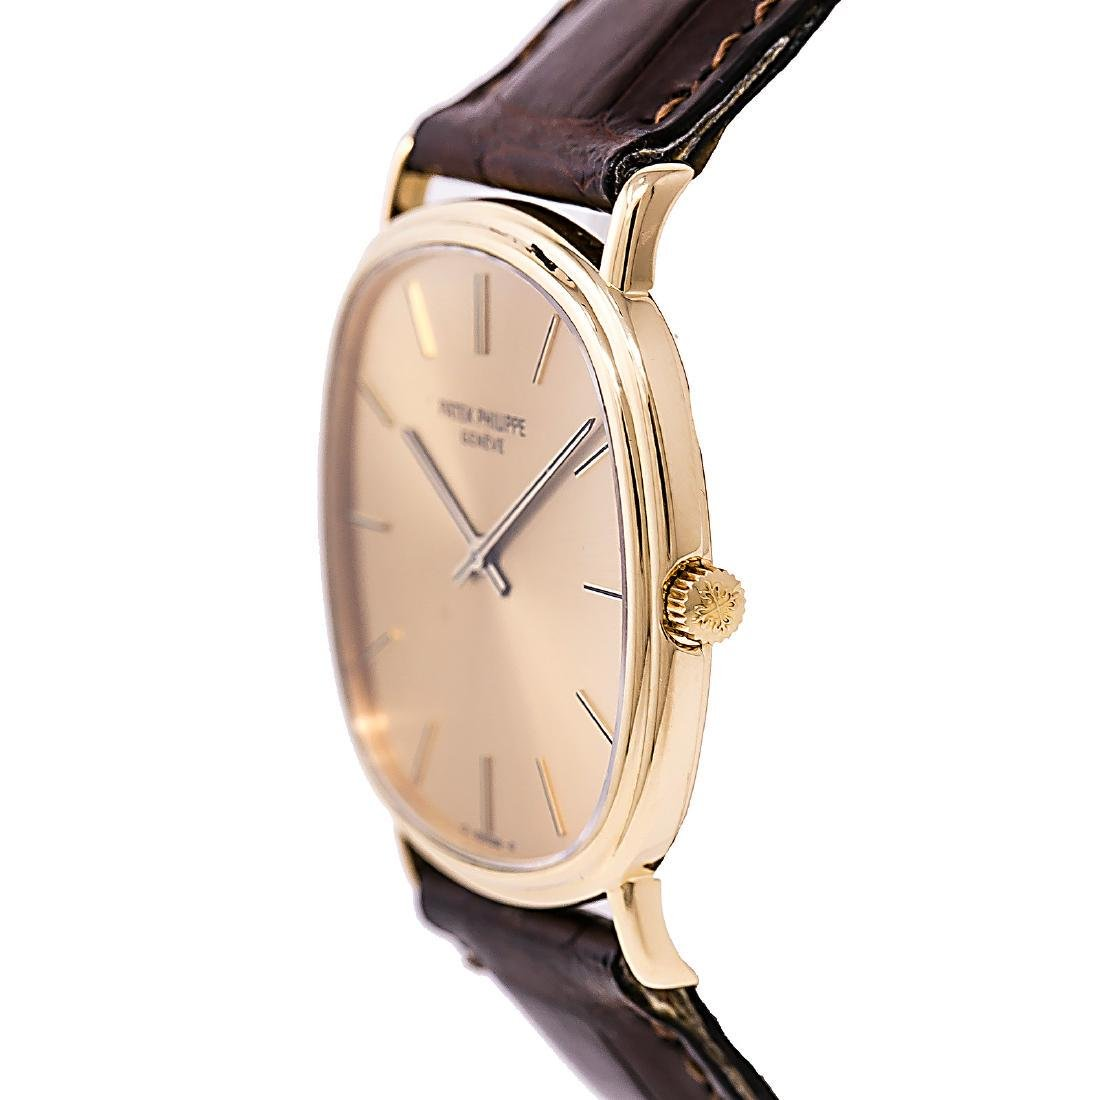 Certified 1990 Patek Philippe Geneve watch - 3